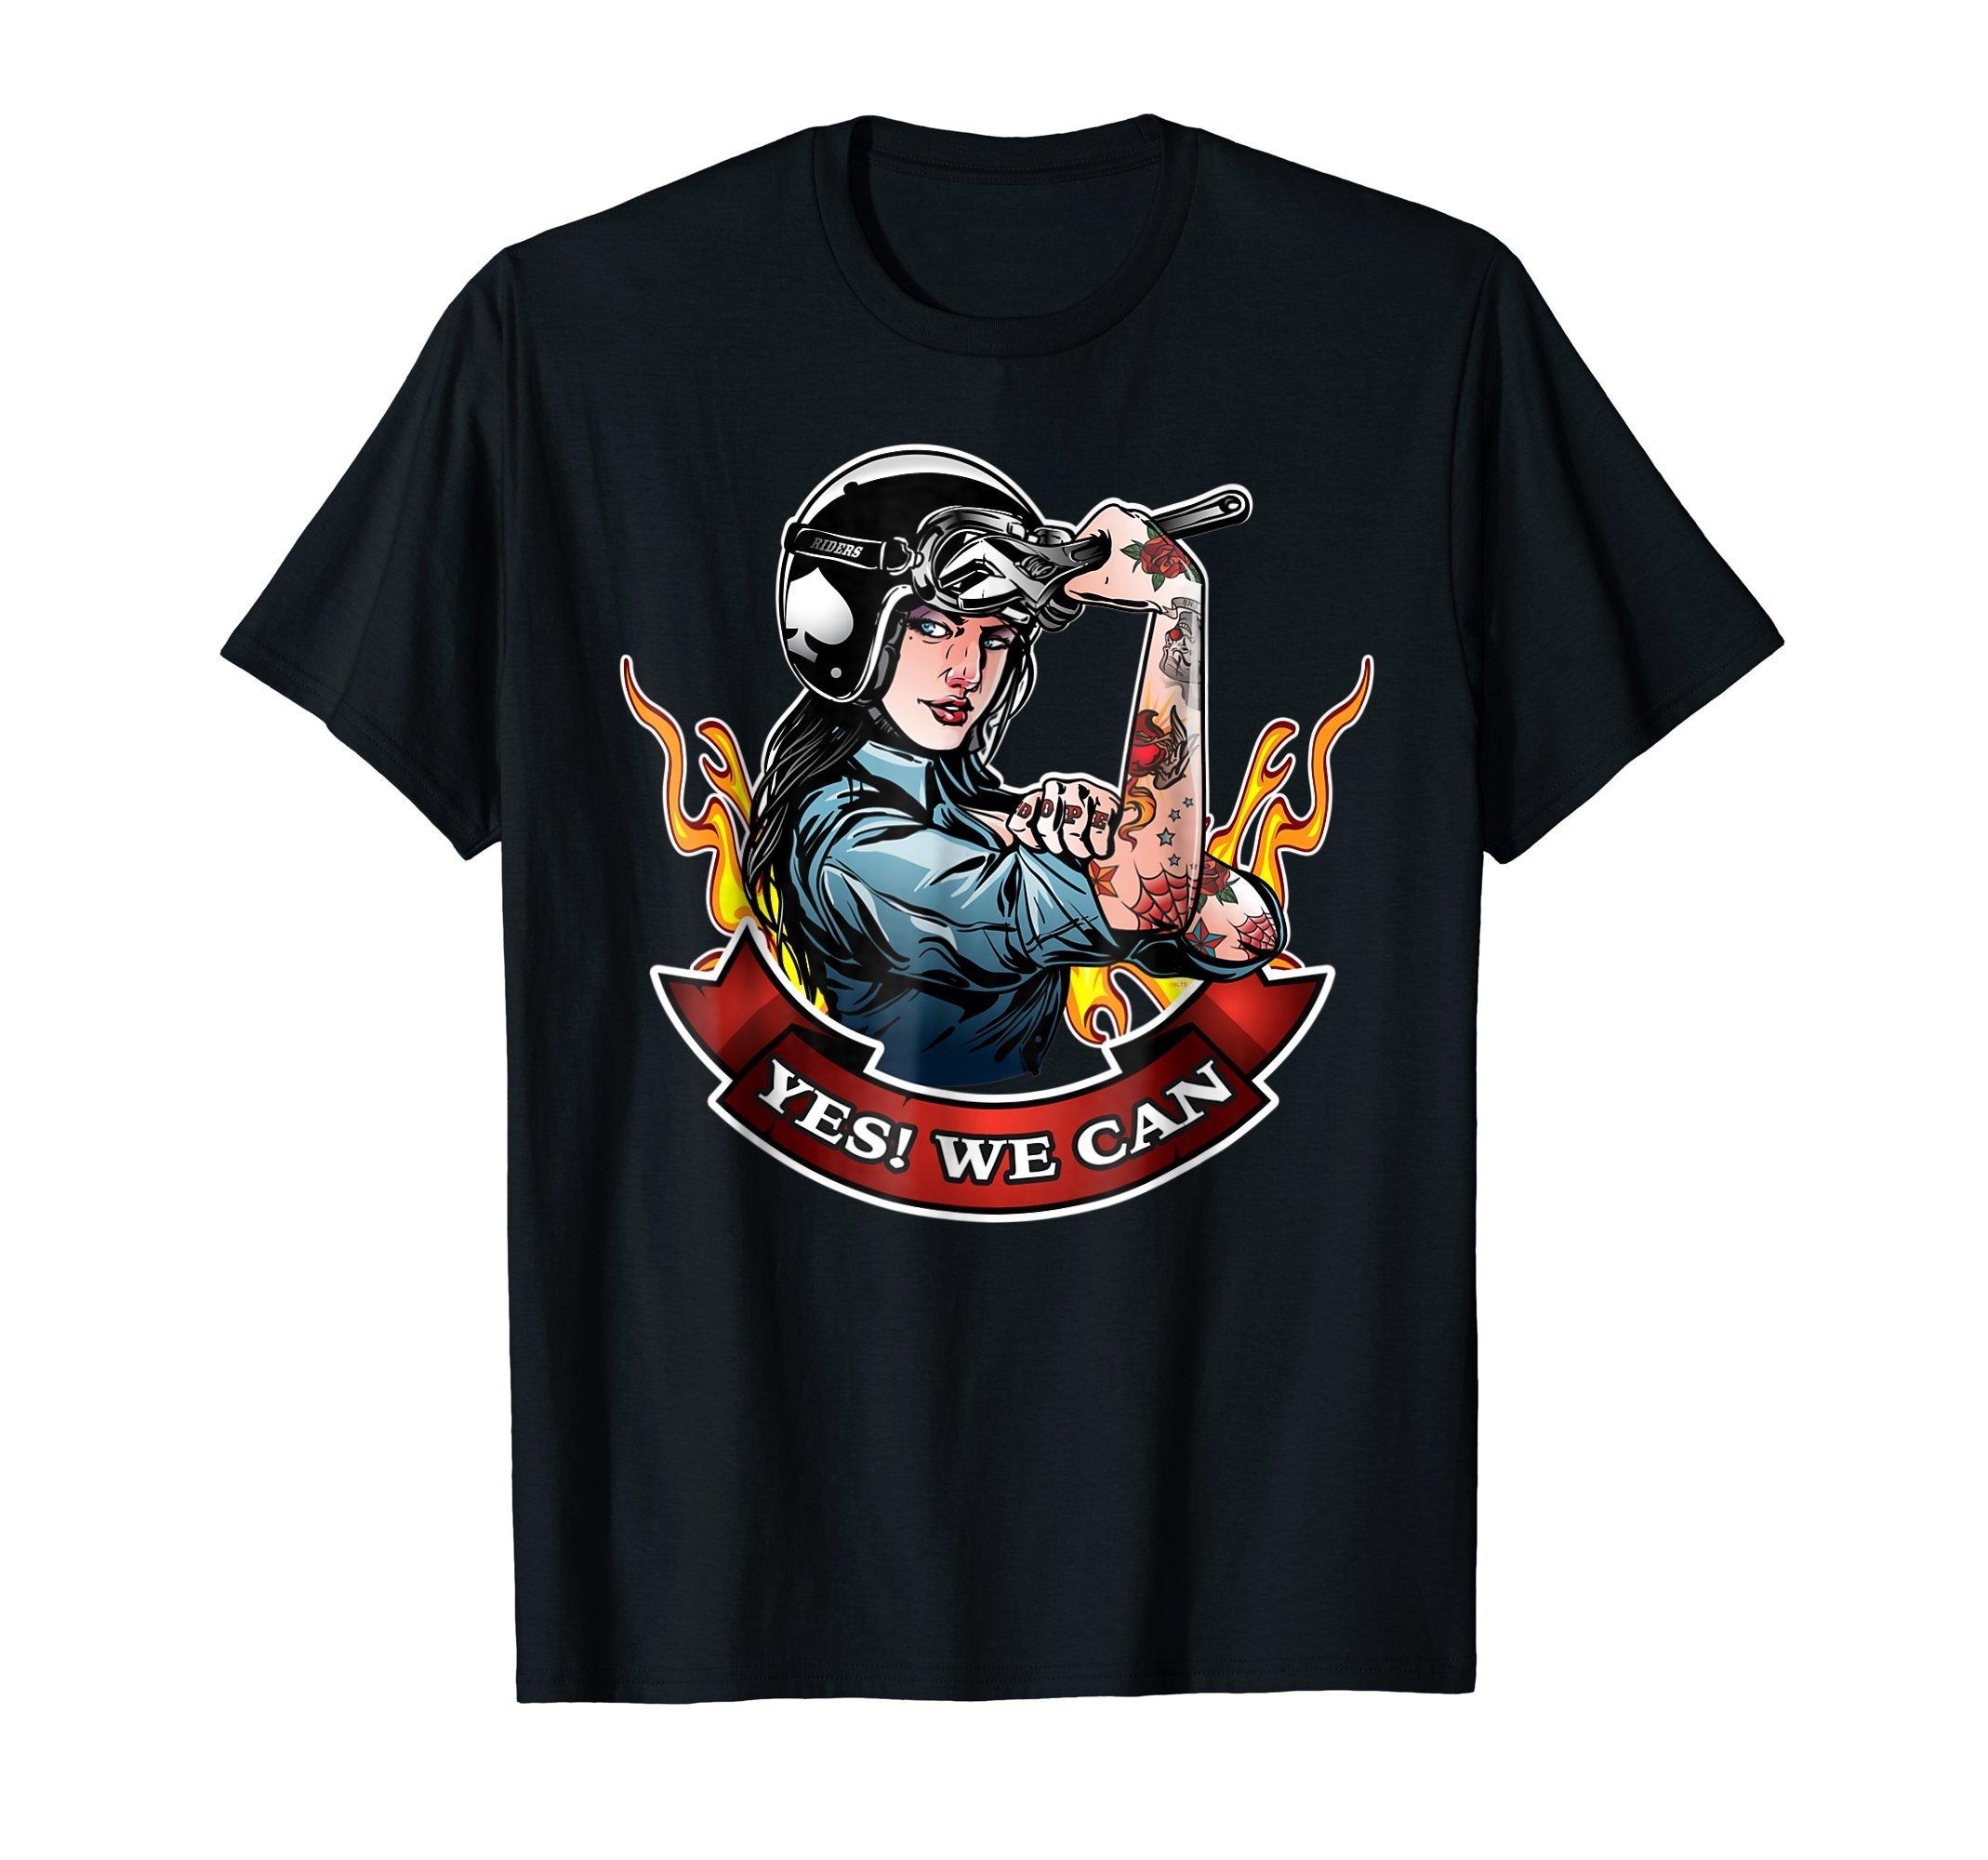 Yes-We-can-Biker-Woman-Motorcycle-T-Shirt-Shirt-Tee